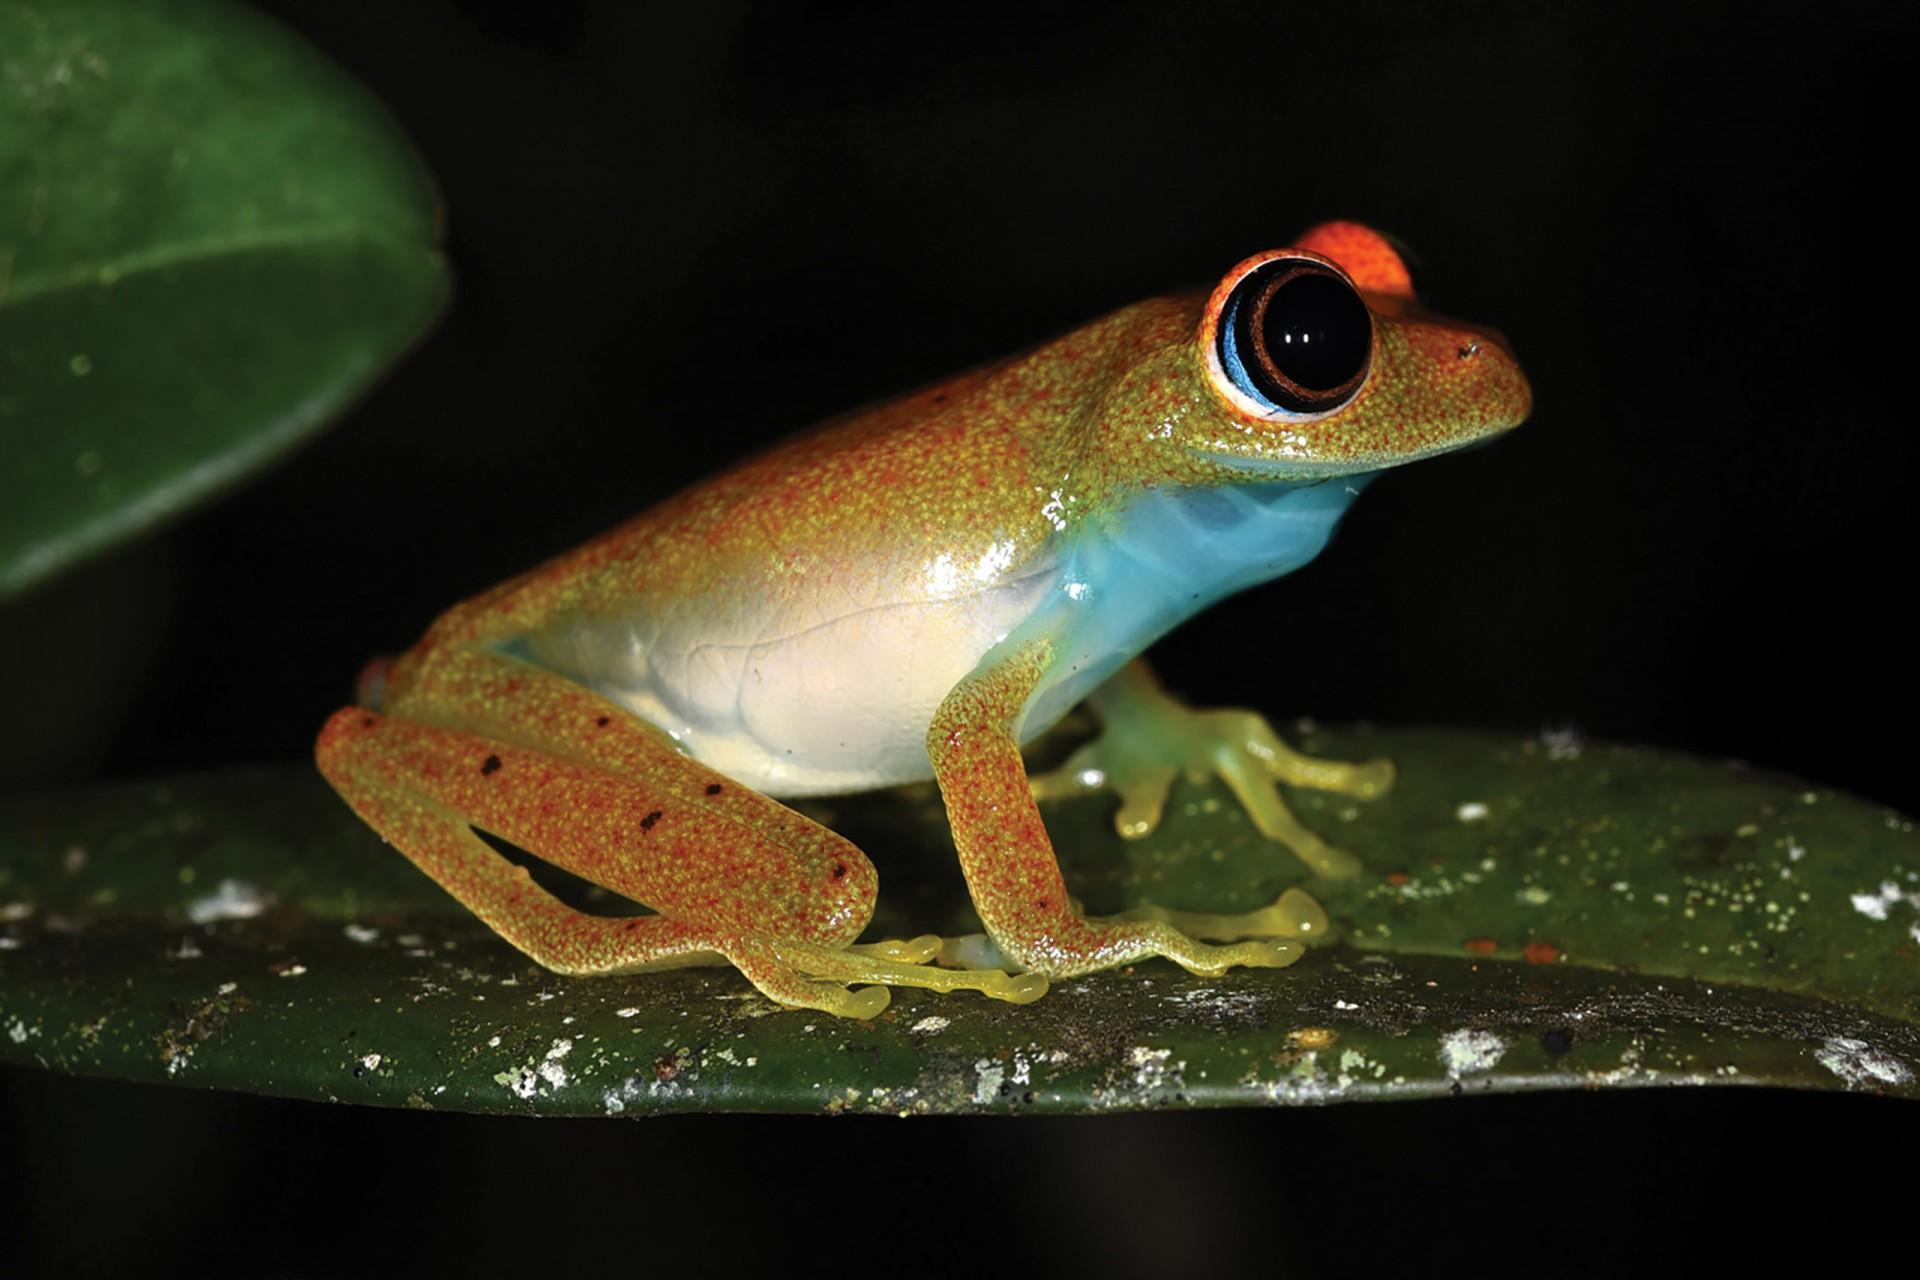 Boophis viridis, Green bright-eyed frog, endemic to Madagascar